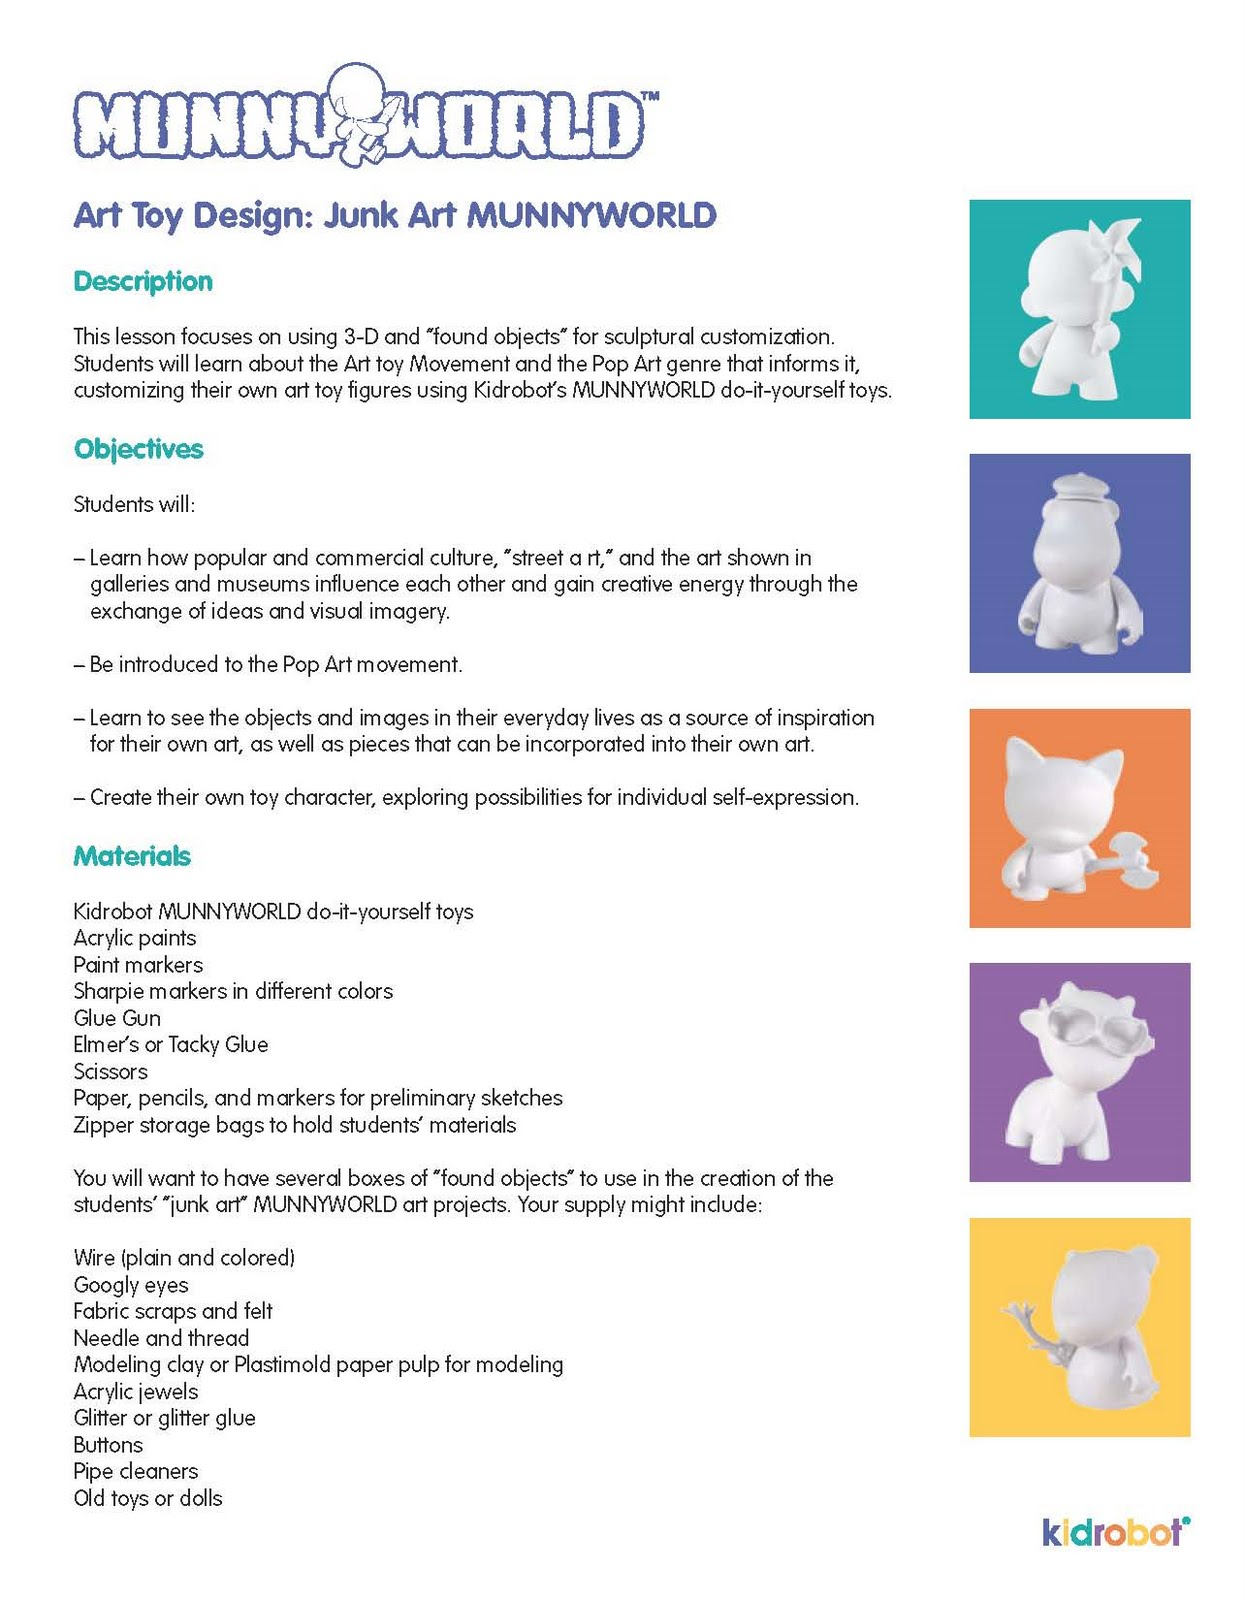 Nick Birch Fmp Design Context Kid Robot Munny World